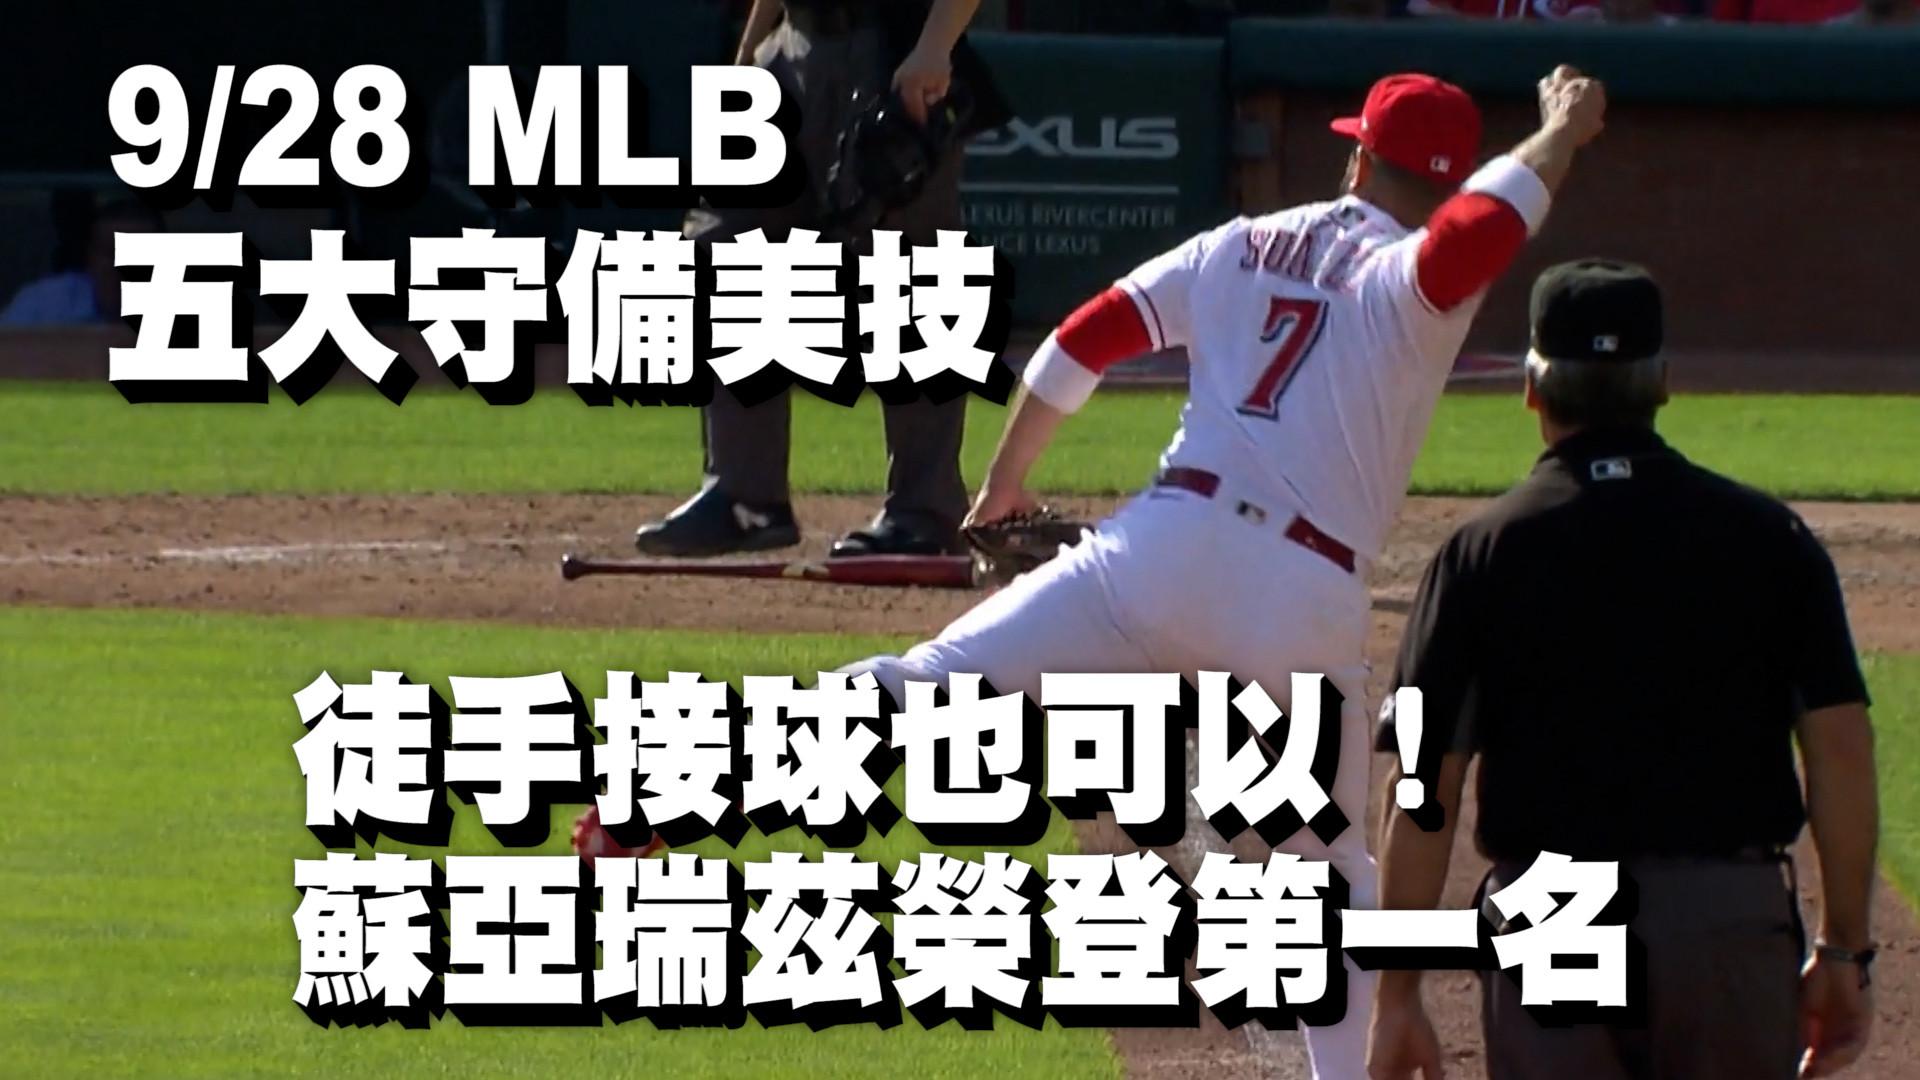 【MLB看愛爾達】徒手接球也可以!蘇亞瑞茲榮登第一名 9/28